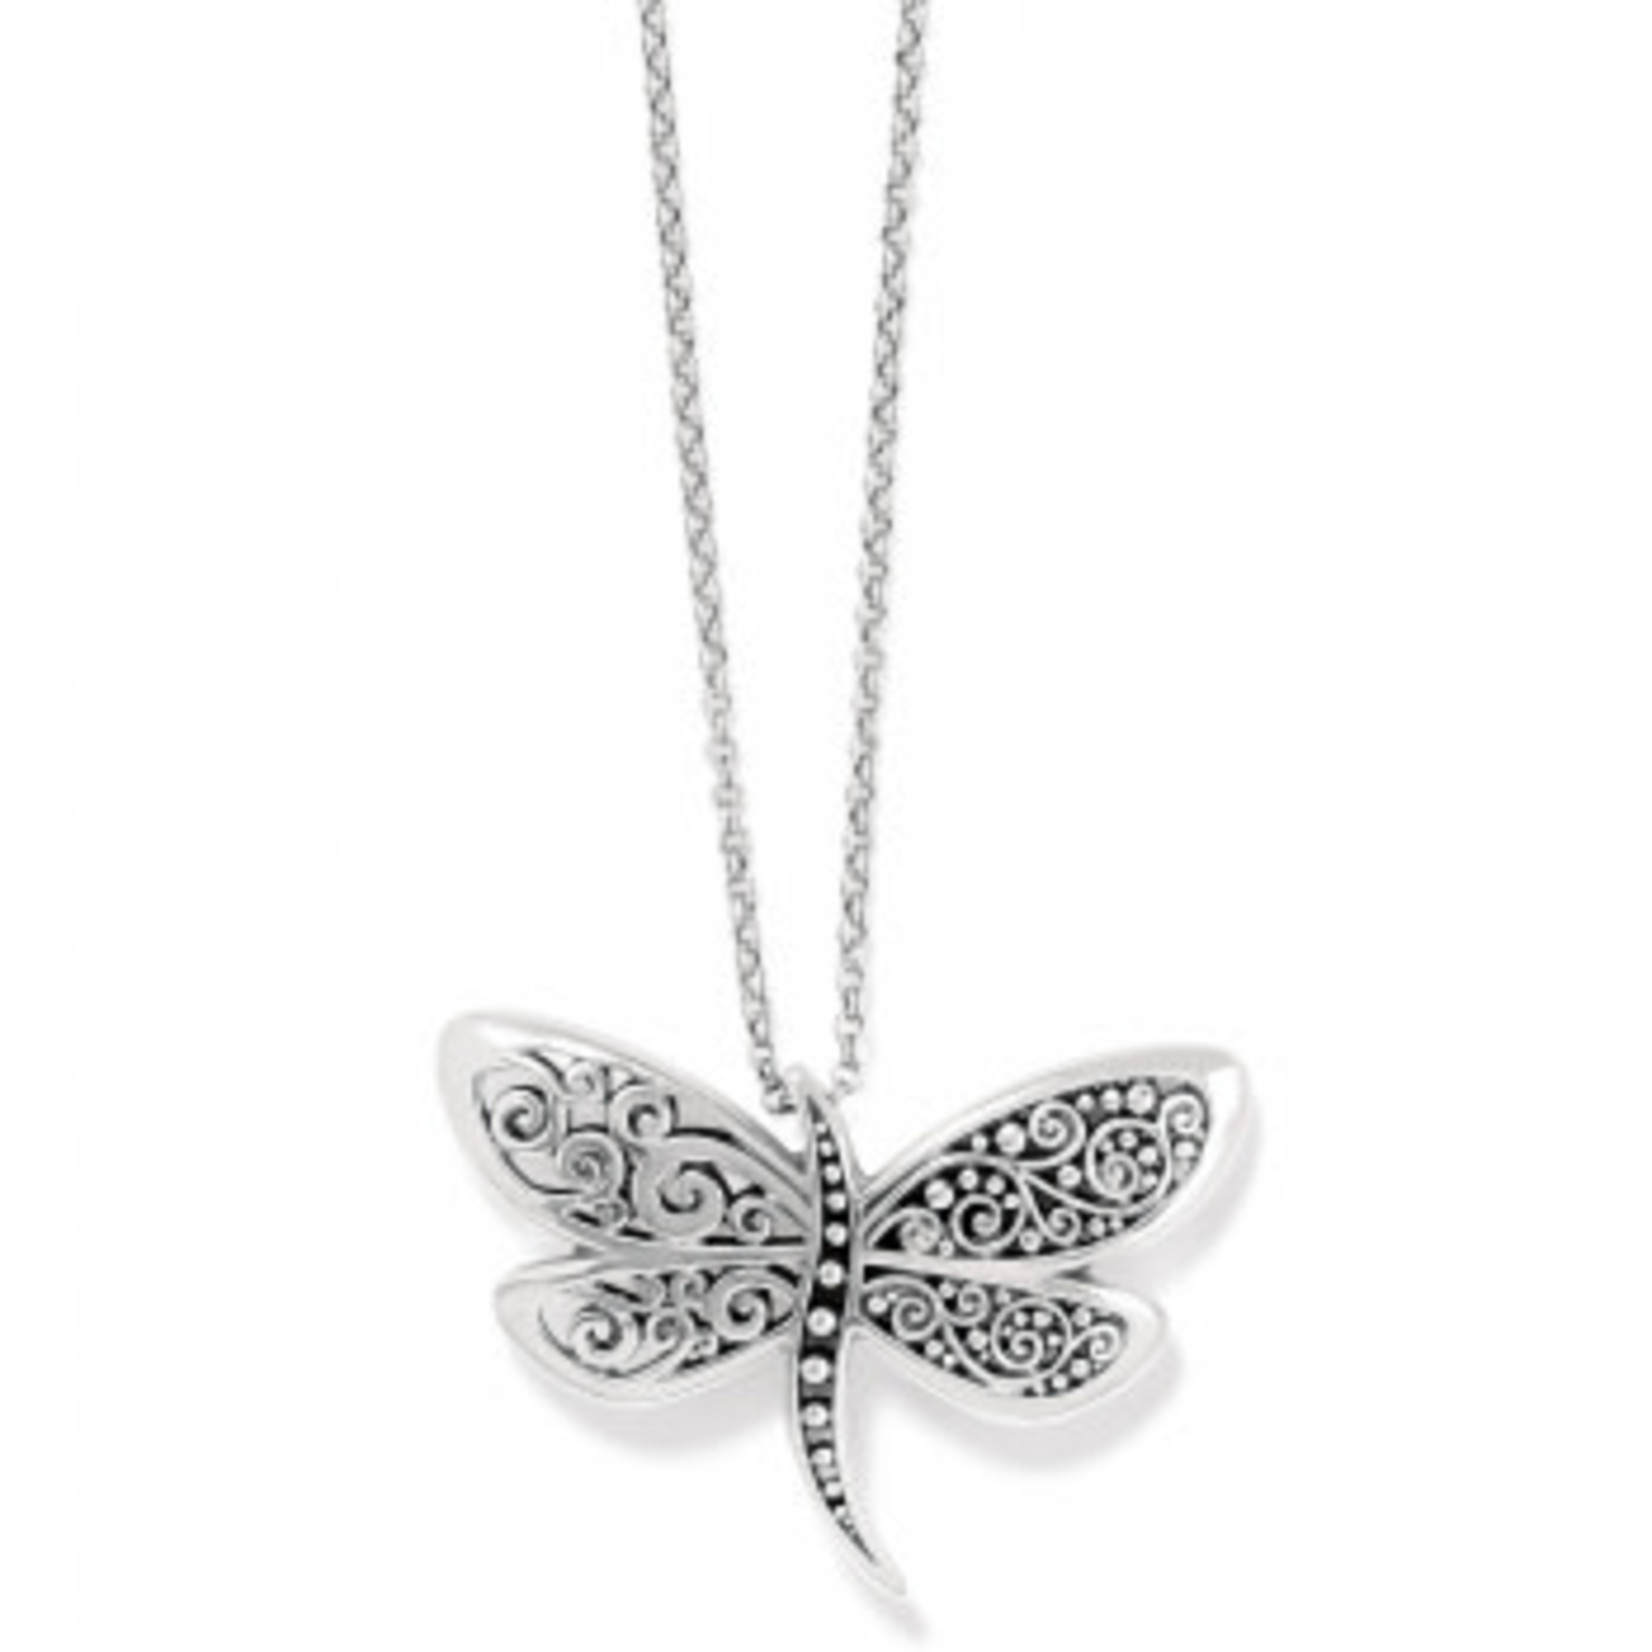 Brighton Love AffaIr Dragonfly Necklace